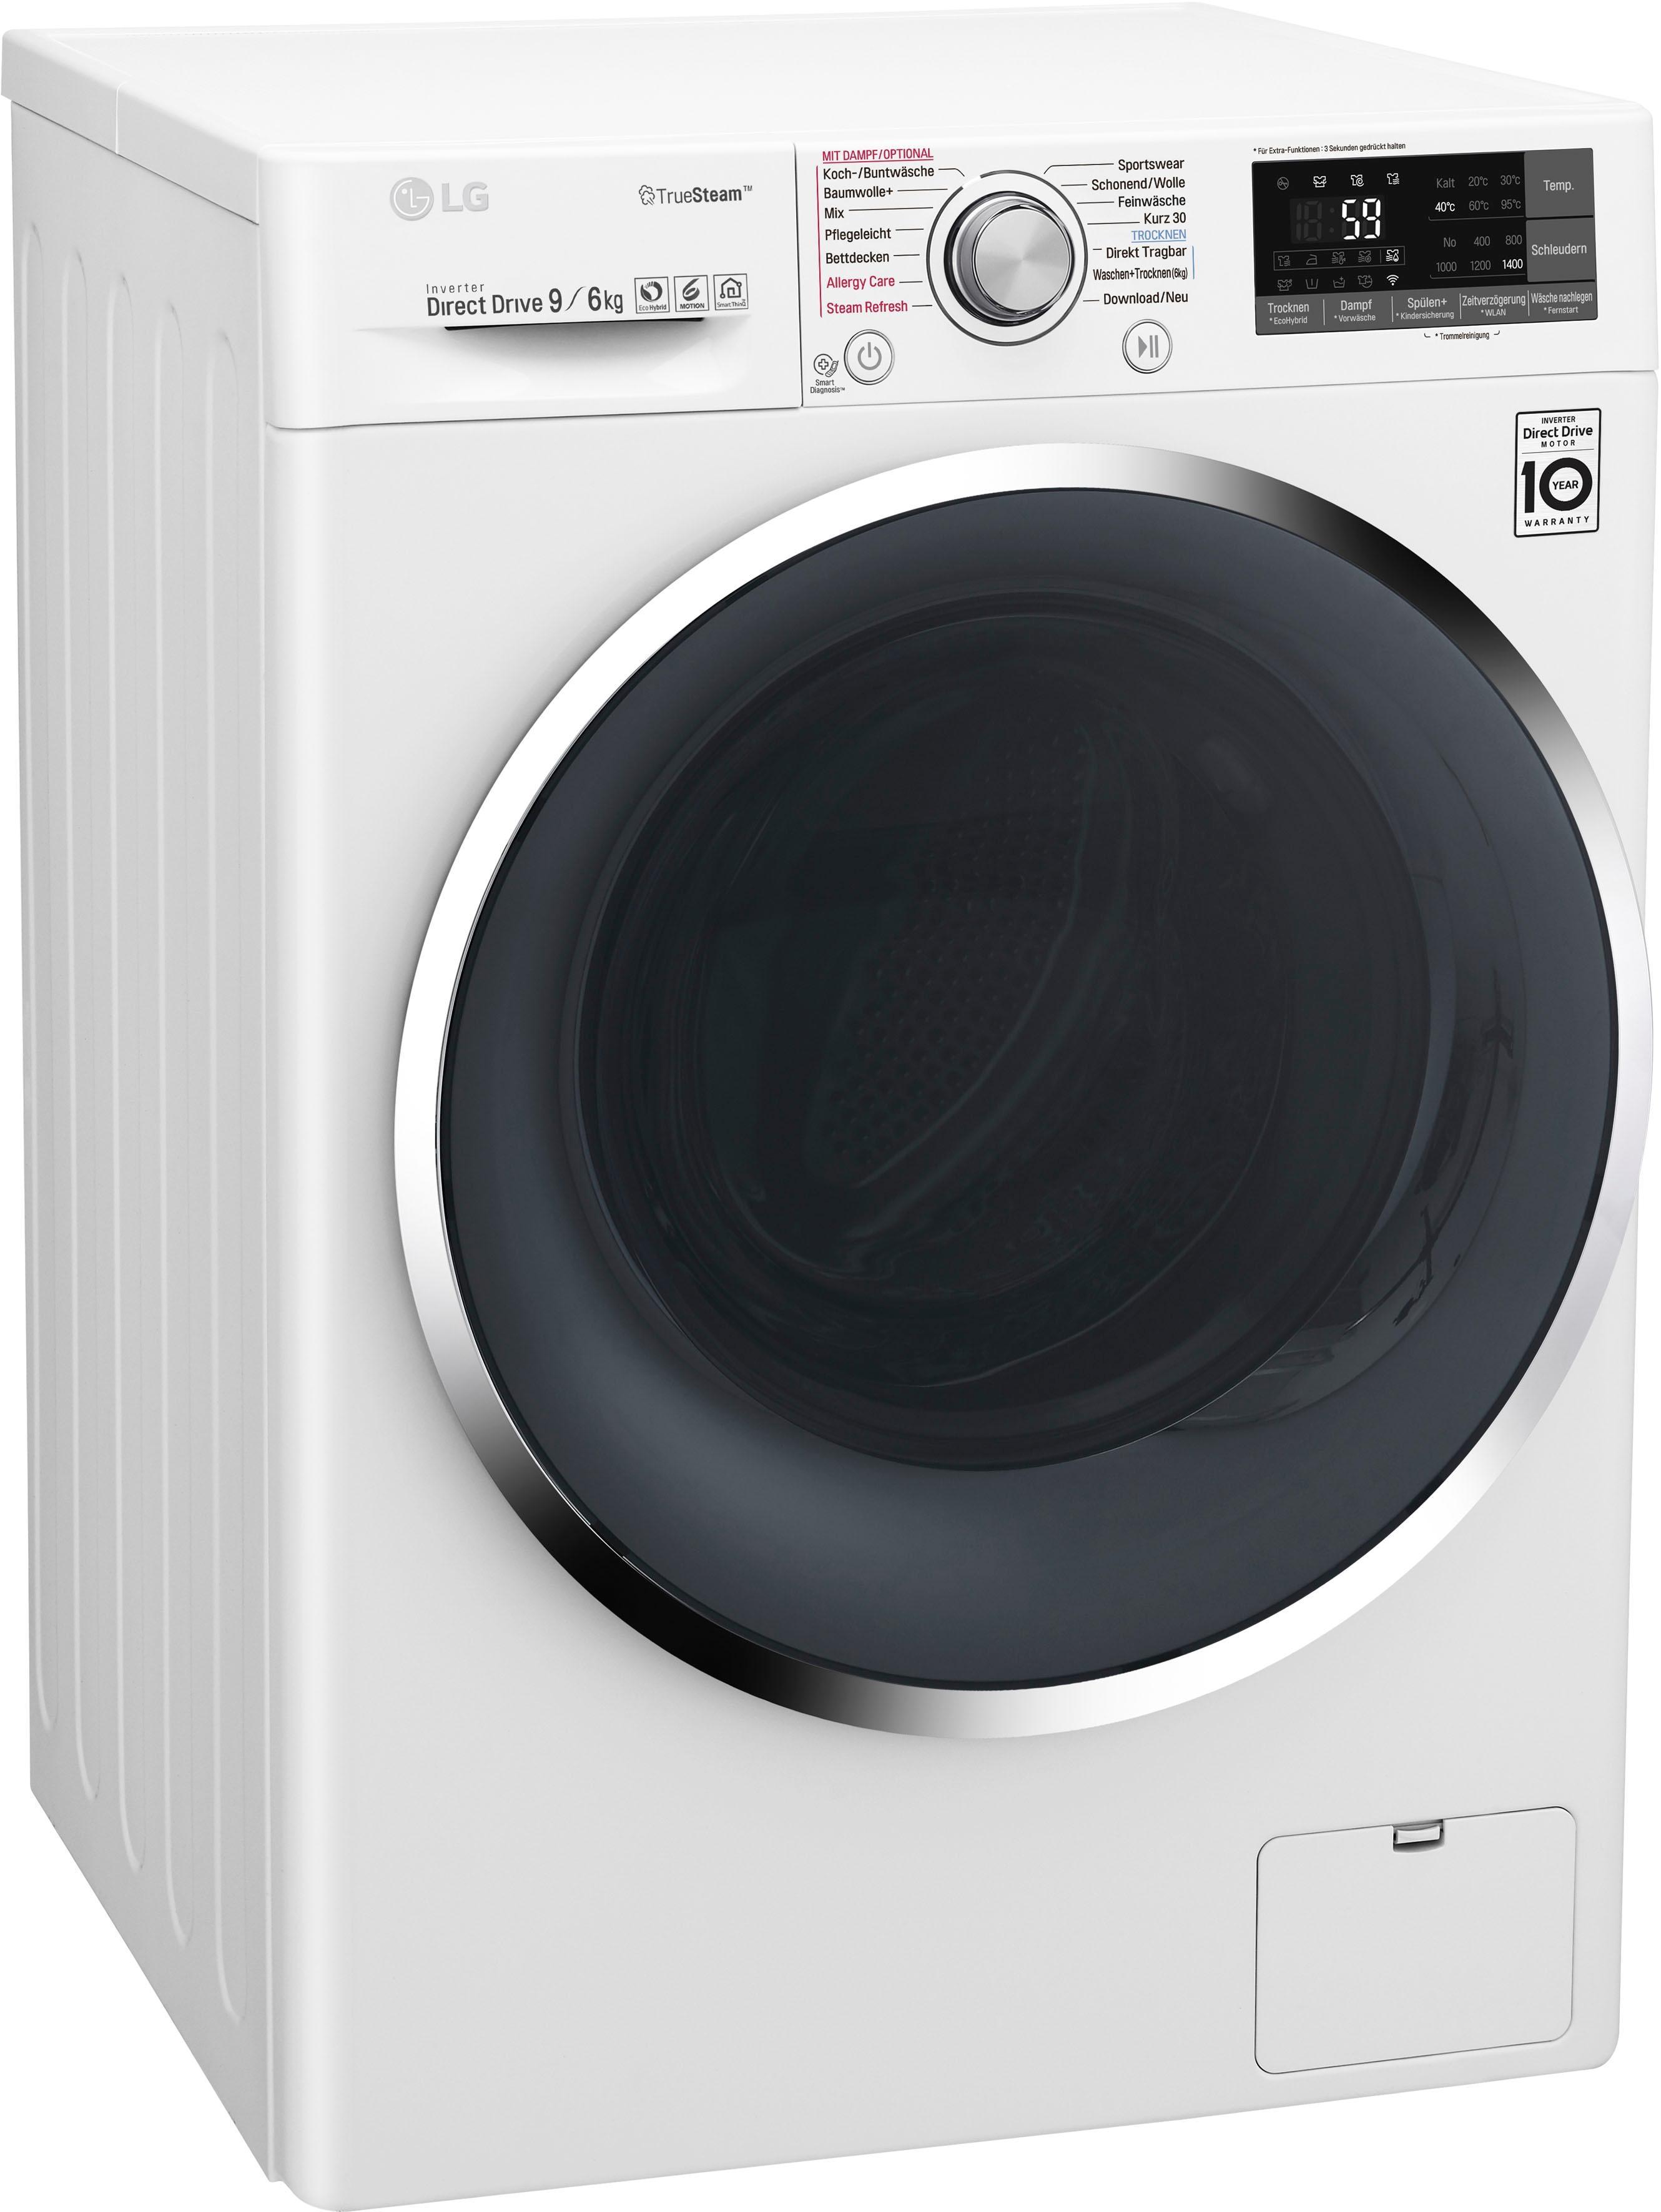 LG Waschtrockner 9 F14WD96TH2, 9 kg / 6 kg, 1400 U/Min | Bad > Waschmaschinen und Trockner > Waschtrockner | Weiß | LG